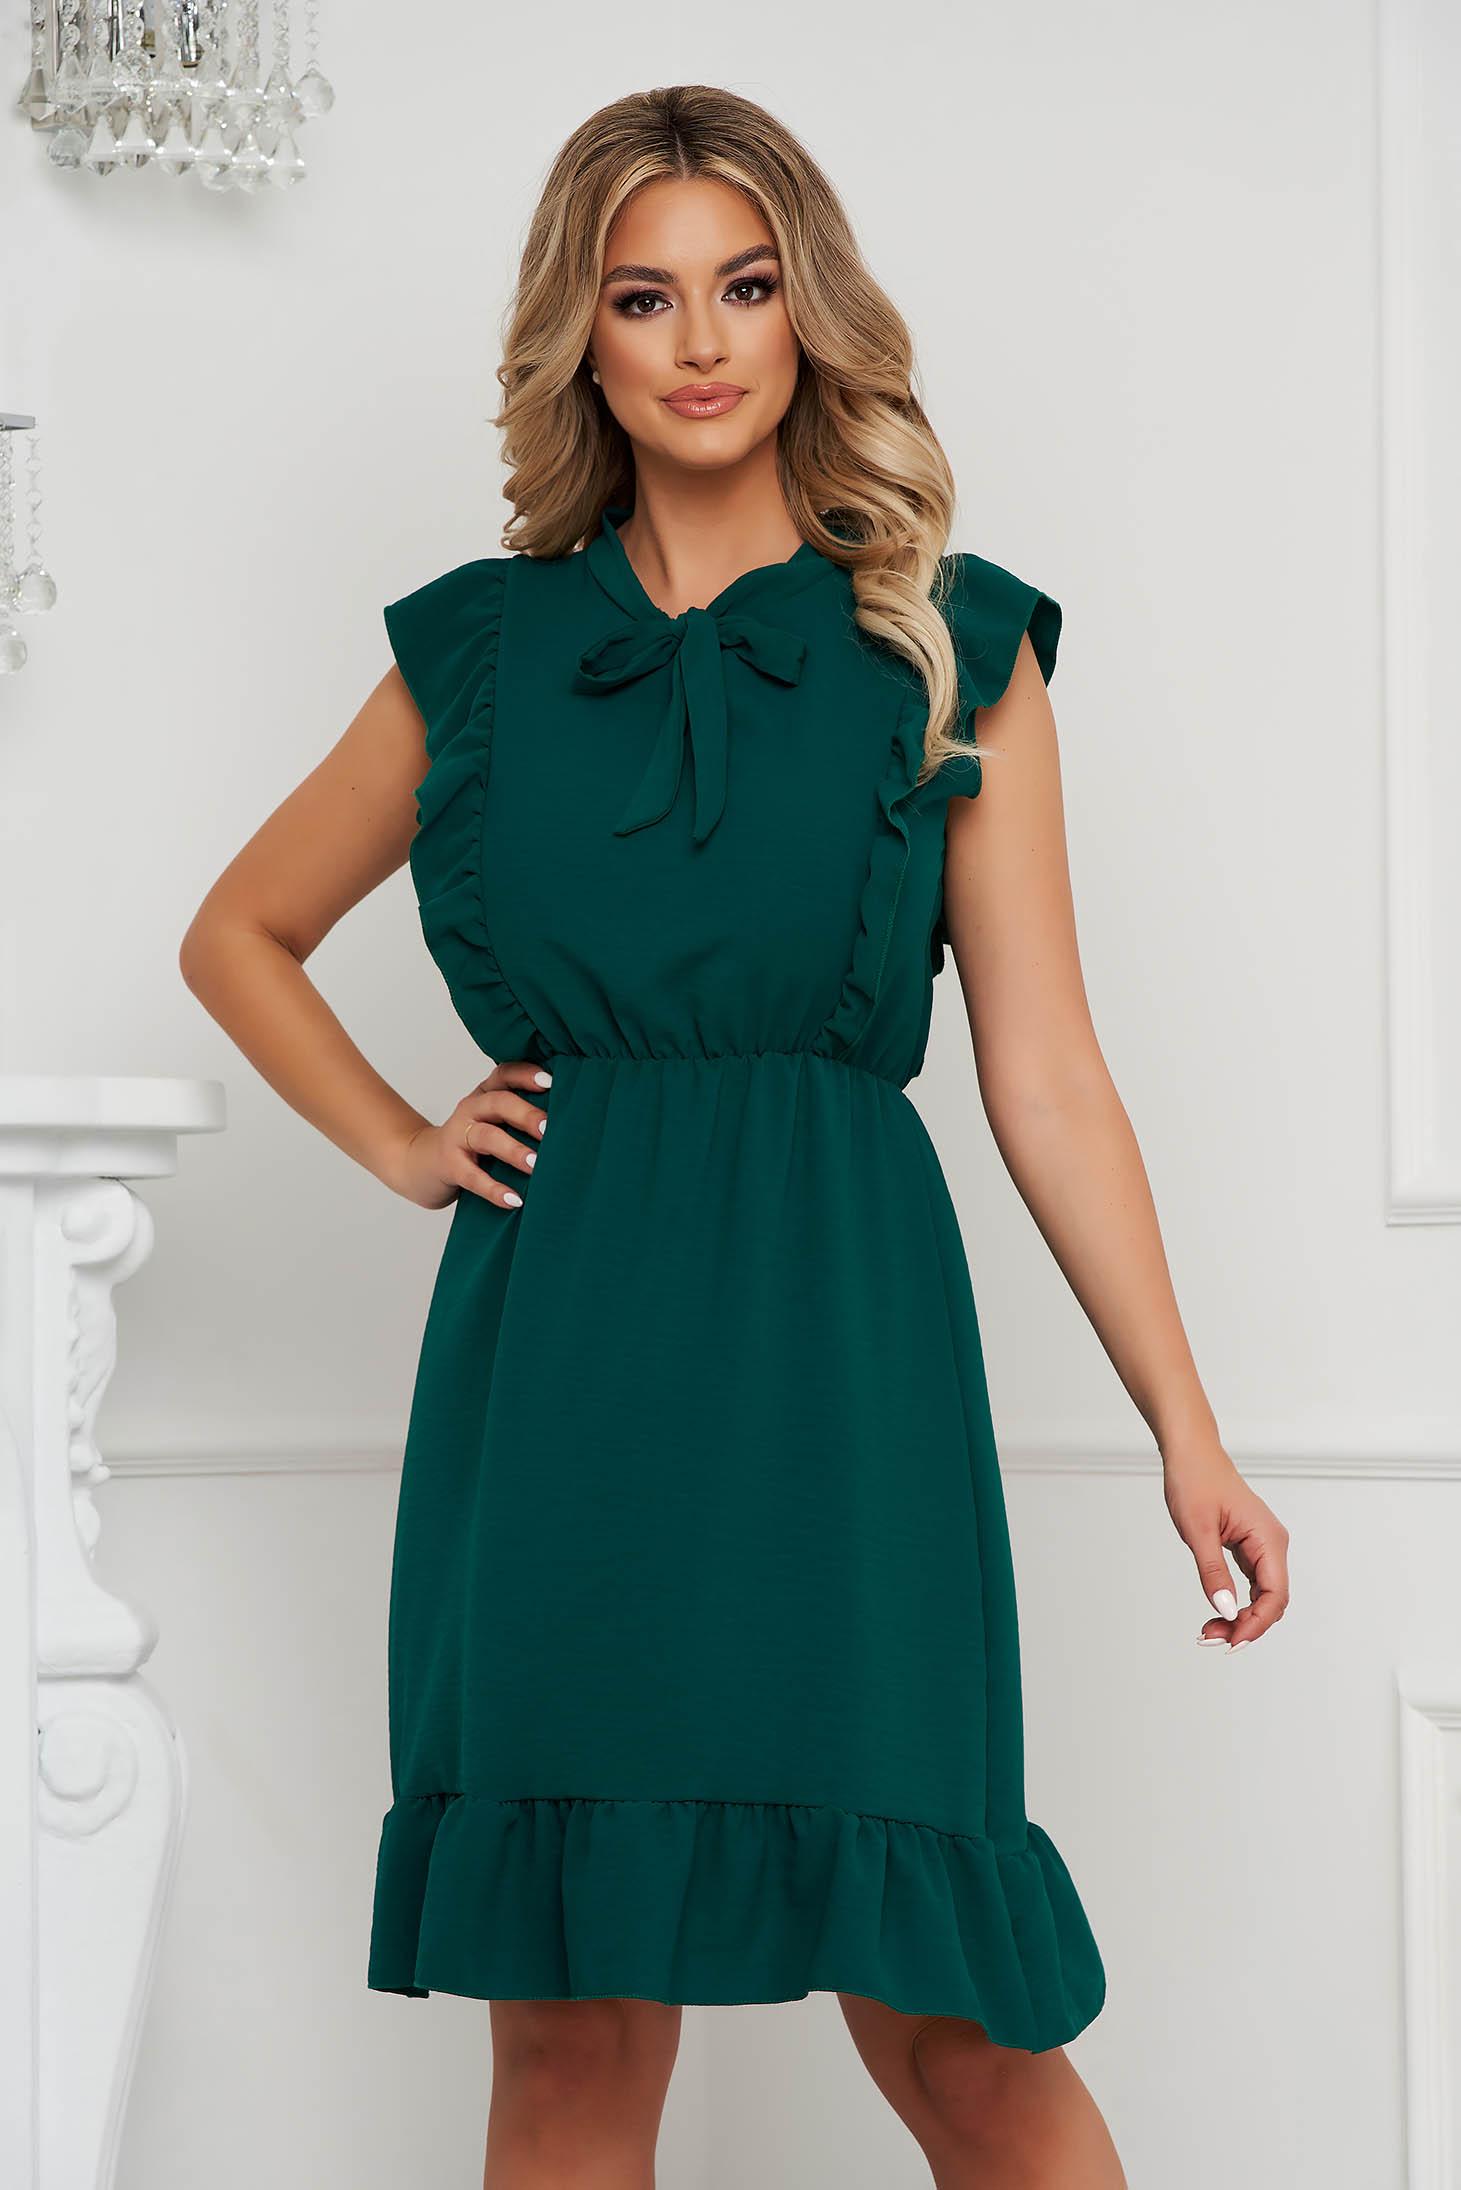 Darkgreen dress short cut cloche with elastic waist airy fabric with ruffle details